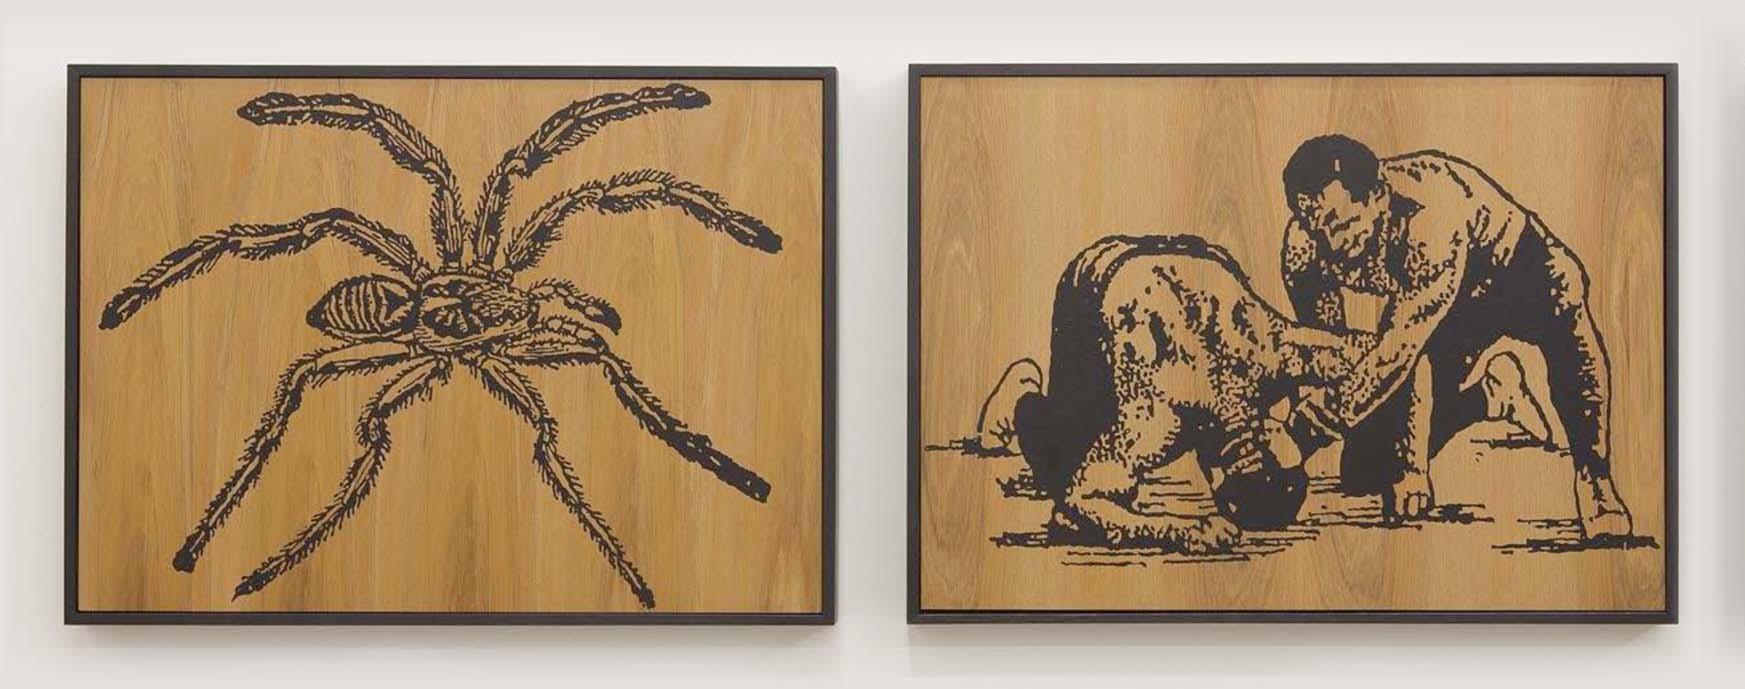 Wayne Youle  When Fear Takes Hold, 2012 Fluid acrylic on rimu (diptych) 450 x 590 mm each  _______